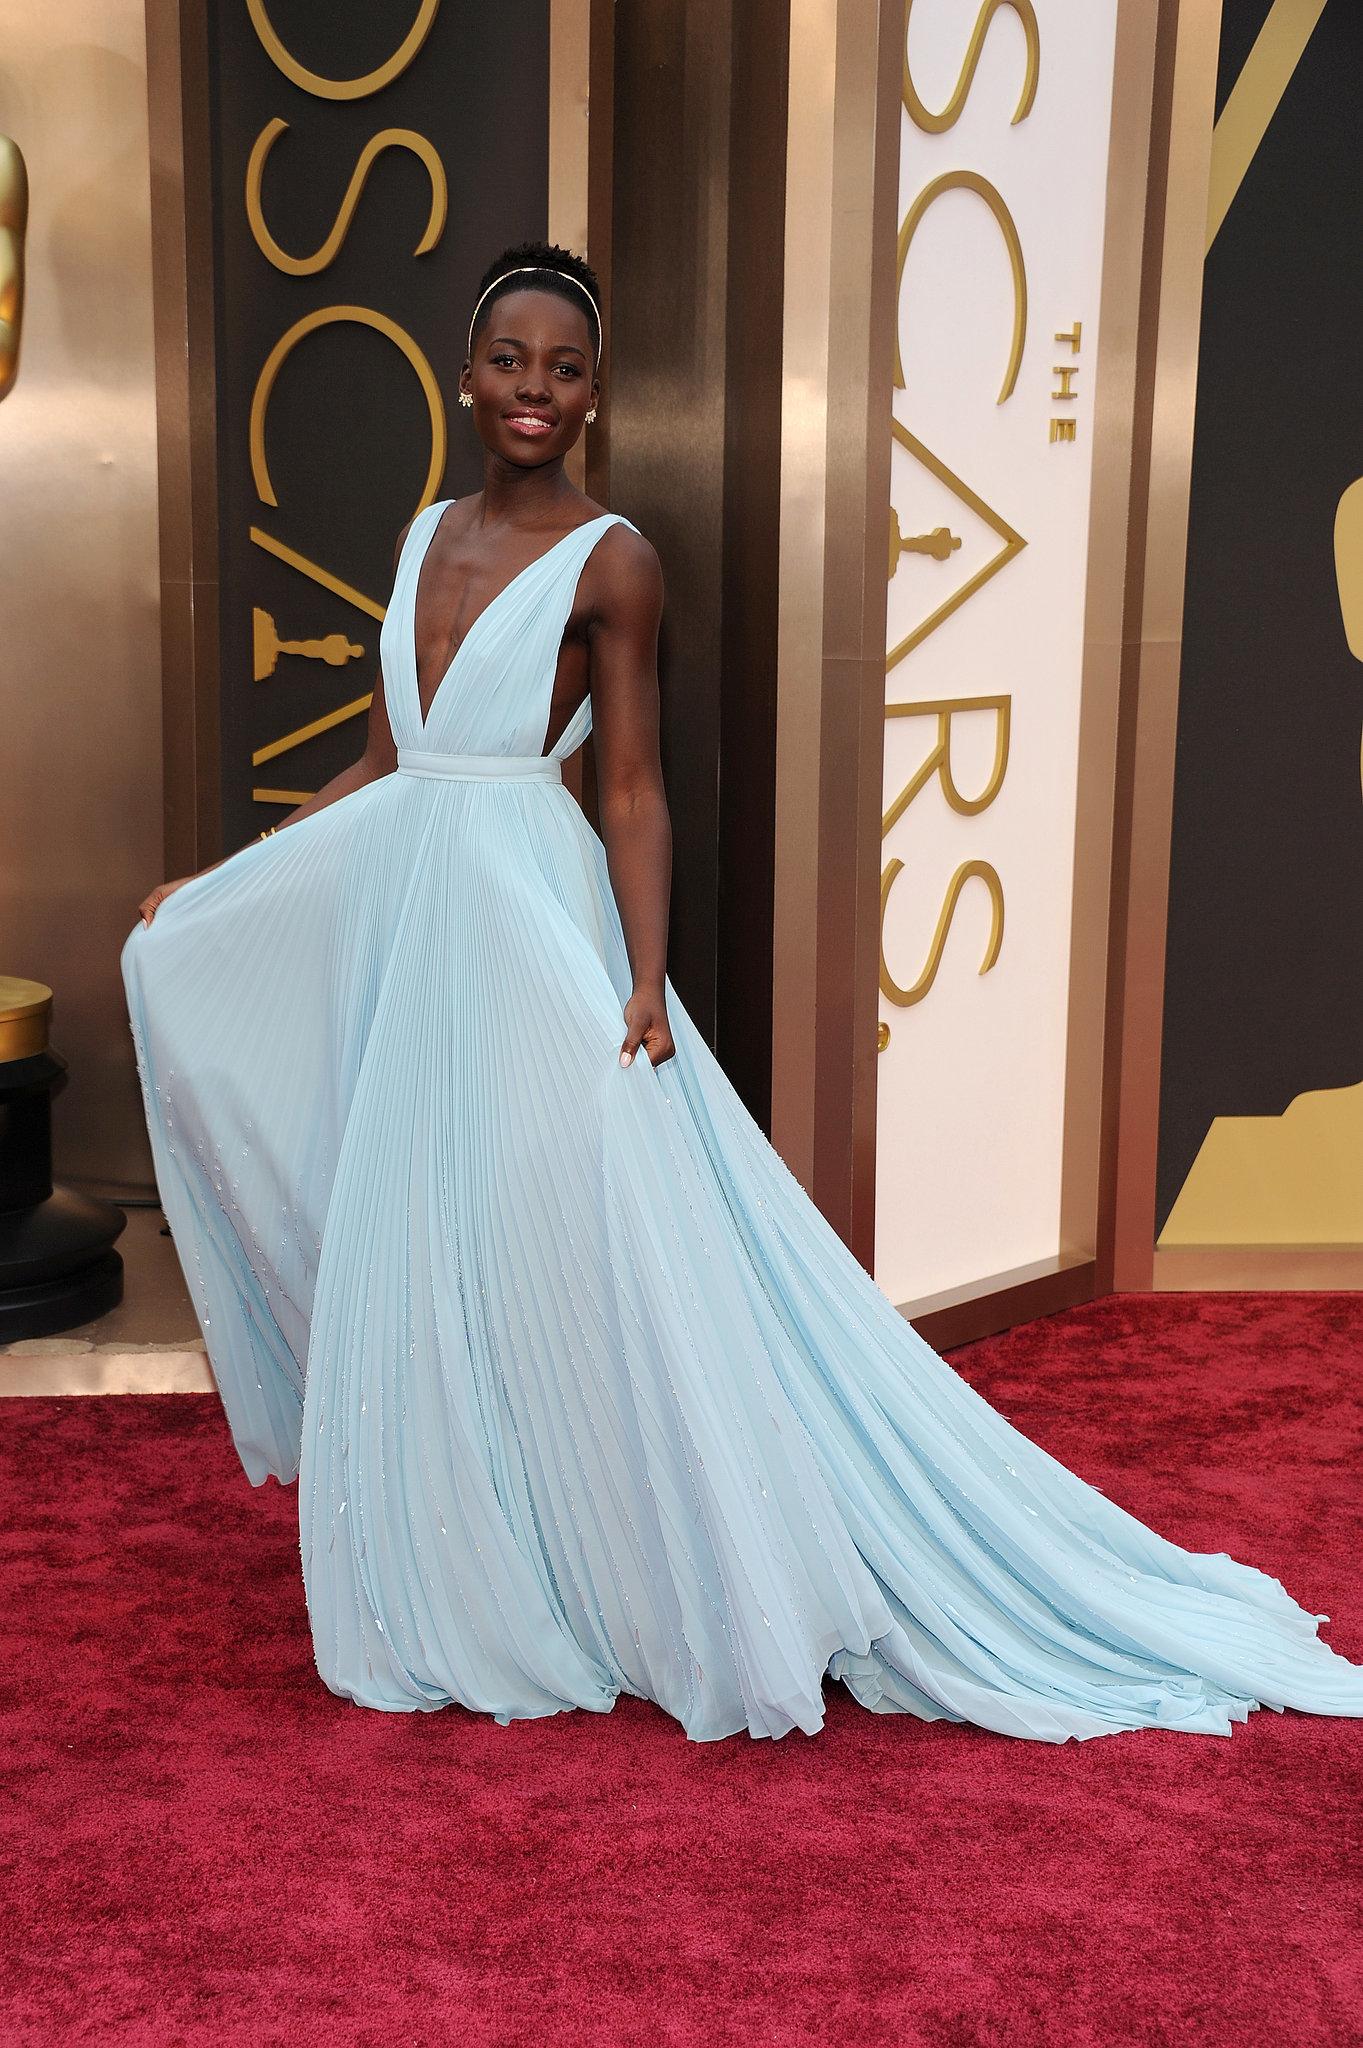 Lupita-Nyongo-Prada-Dress-Oscars-2014-02.jpg